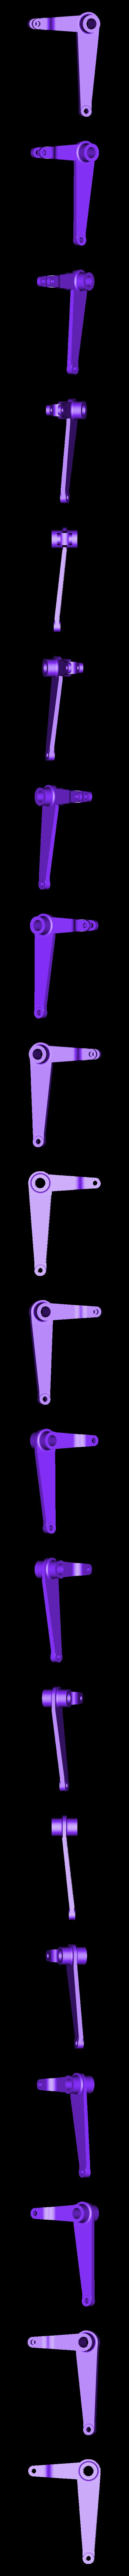 reverse_Shaft_Arm_-_back.STL Download free STL file 4-8-8-4 Big Boy Locomotive • 3D printer object, RaymondDeLuca